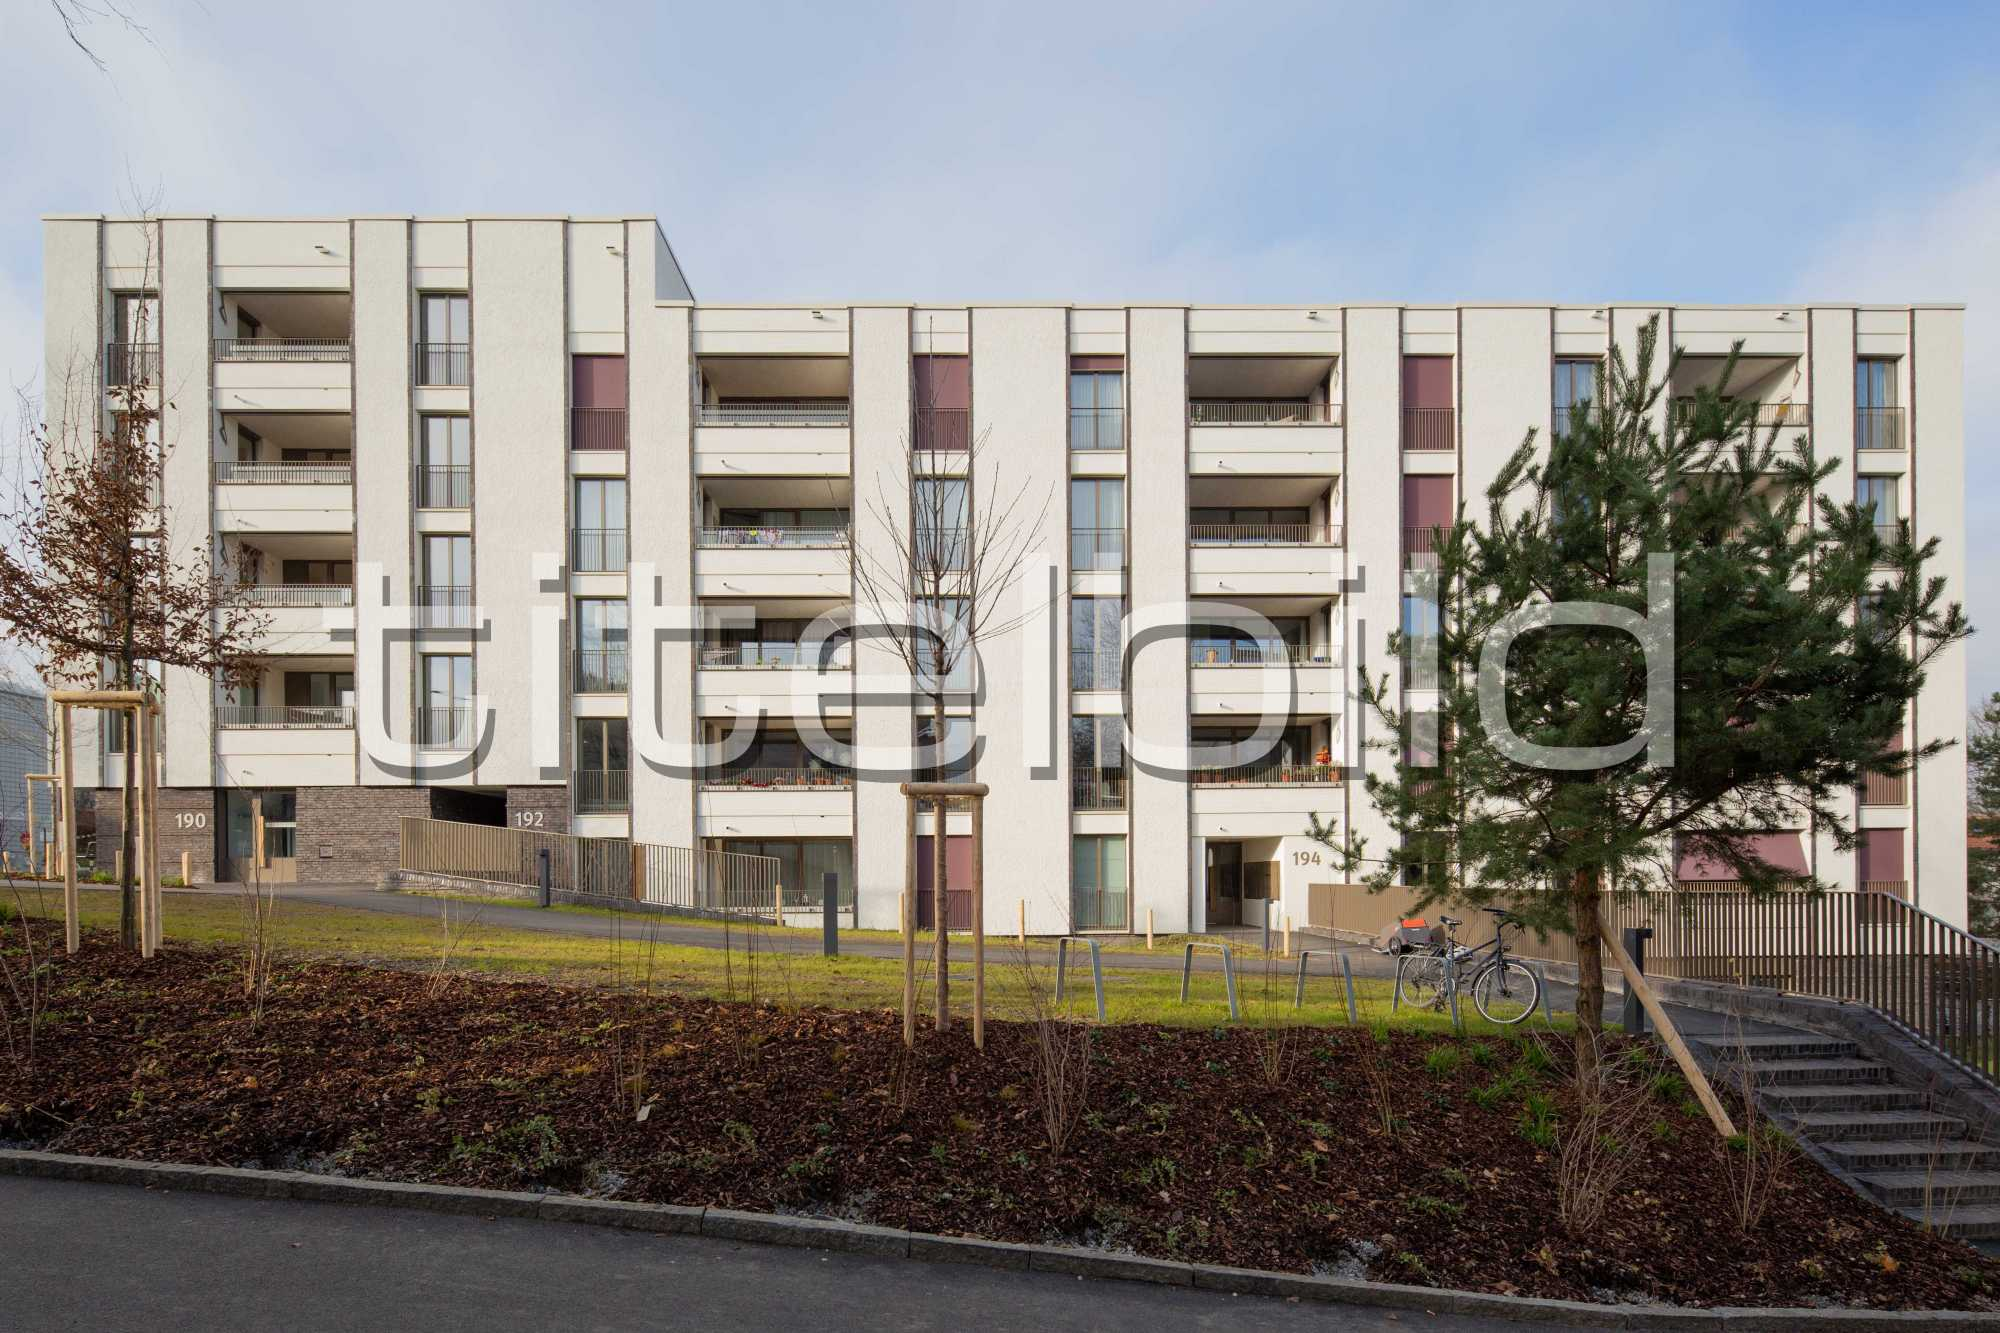 Projektbild-Nr. 1: Quartierzentrum Friesenberg